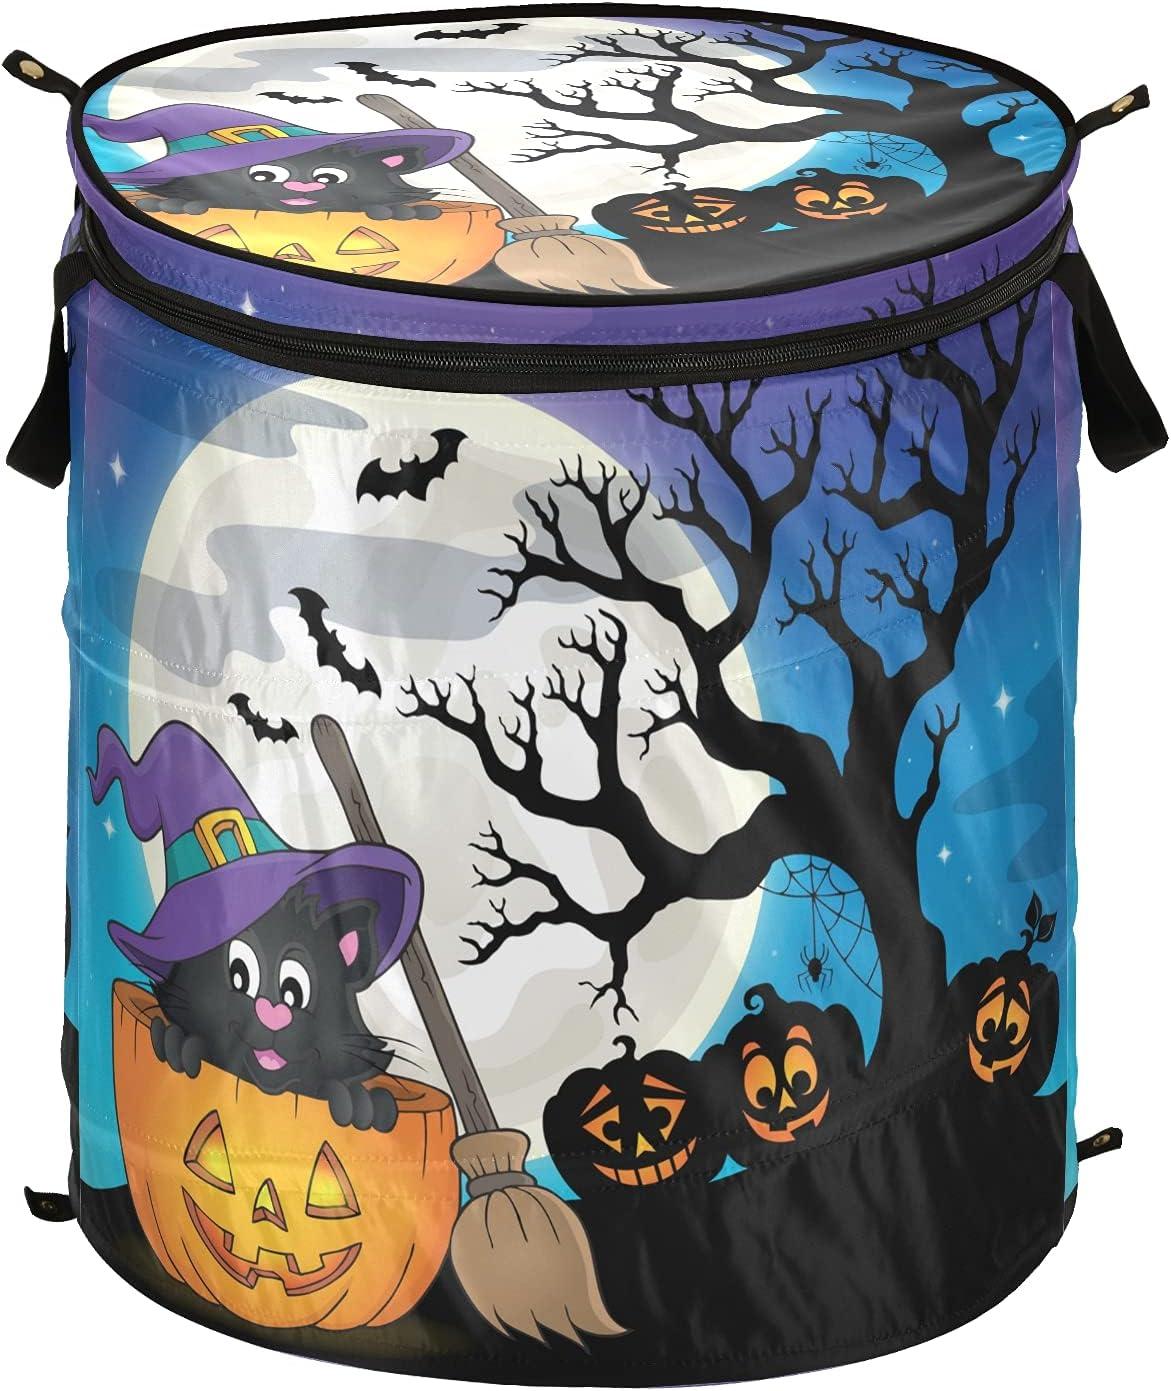 Halloween Jack Lantern Pumpkin Overseas parallel import regular item Max 48% OFF Full Moon w Pop Laundry Hamper Up